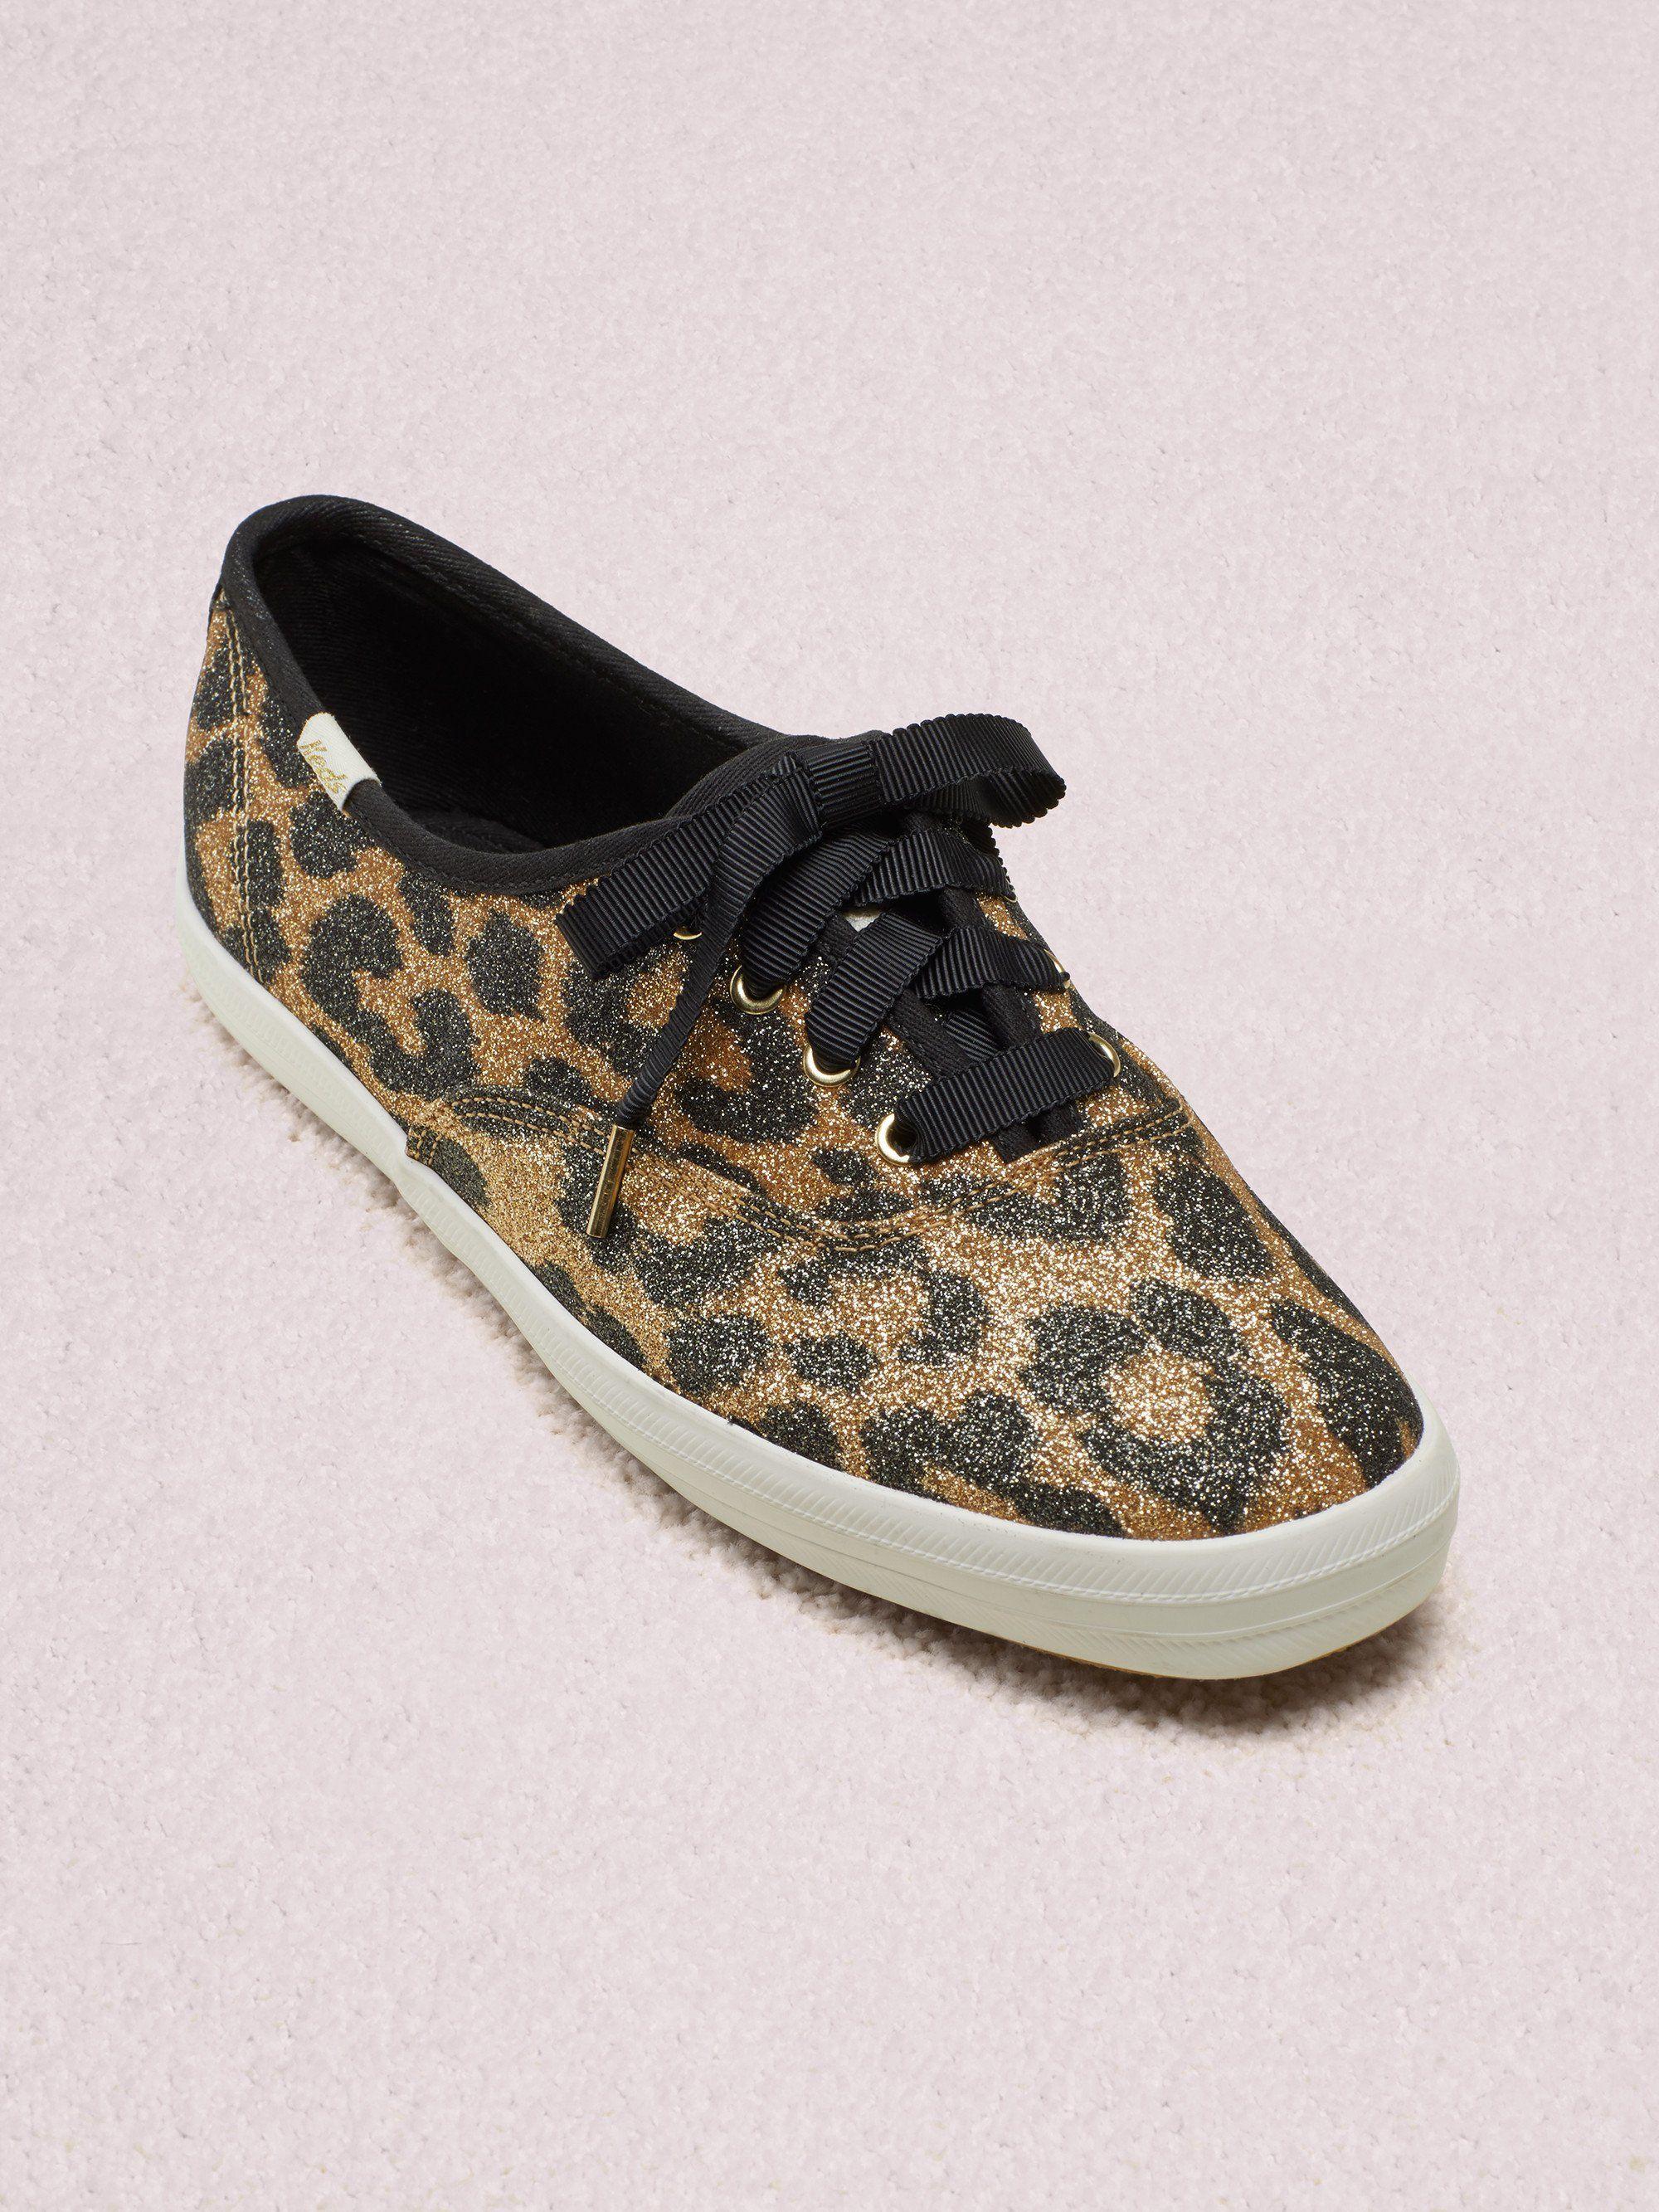 kate spade keds cheetah